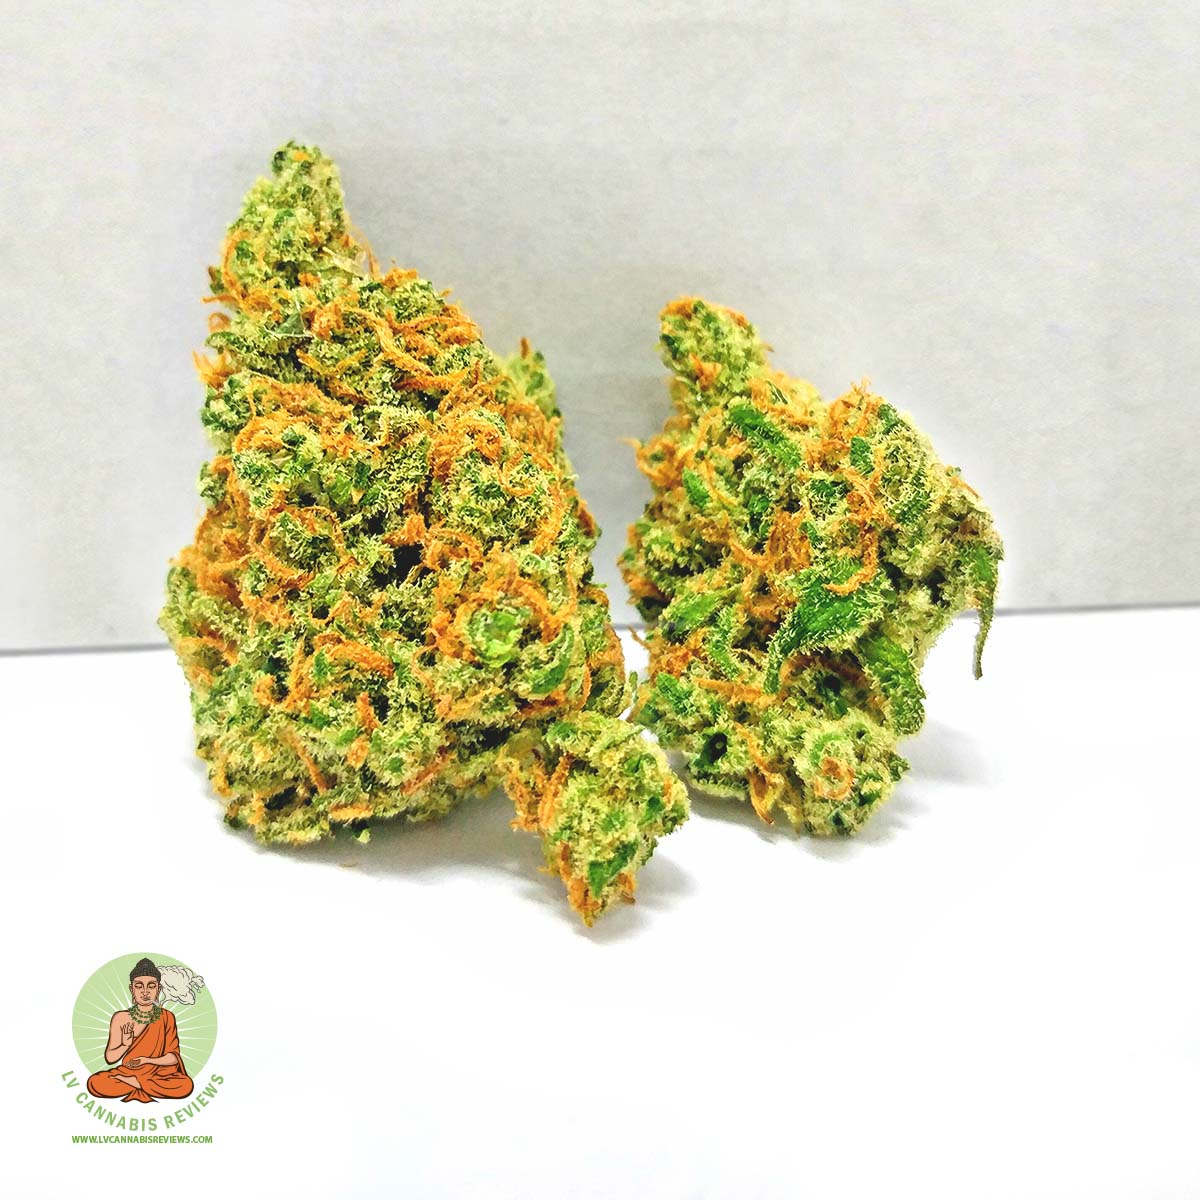 Silver Mountain #2 Bud